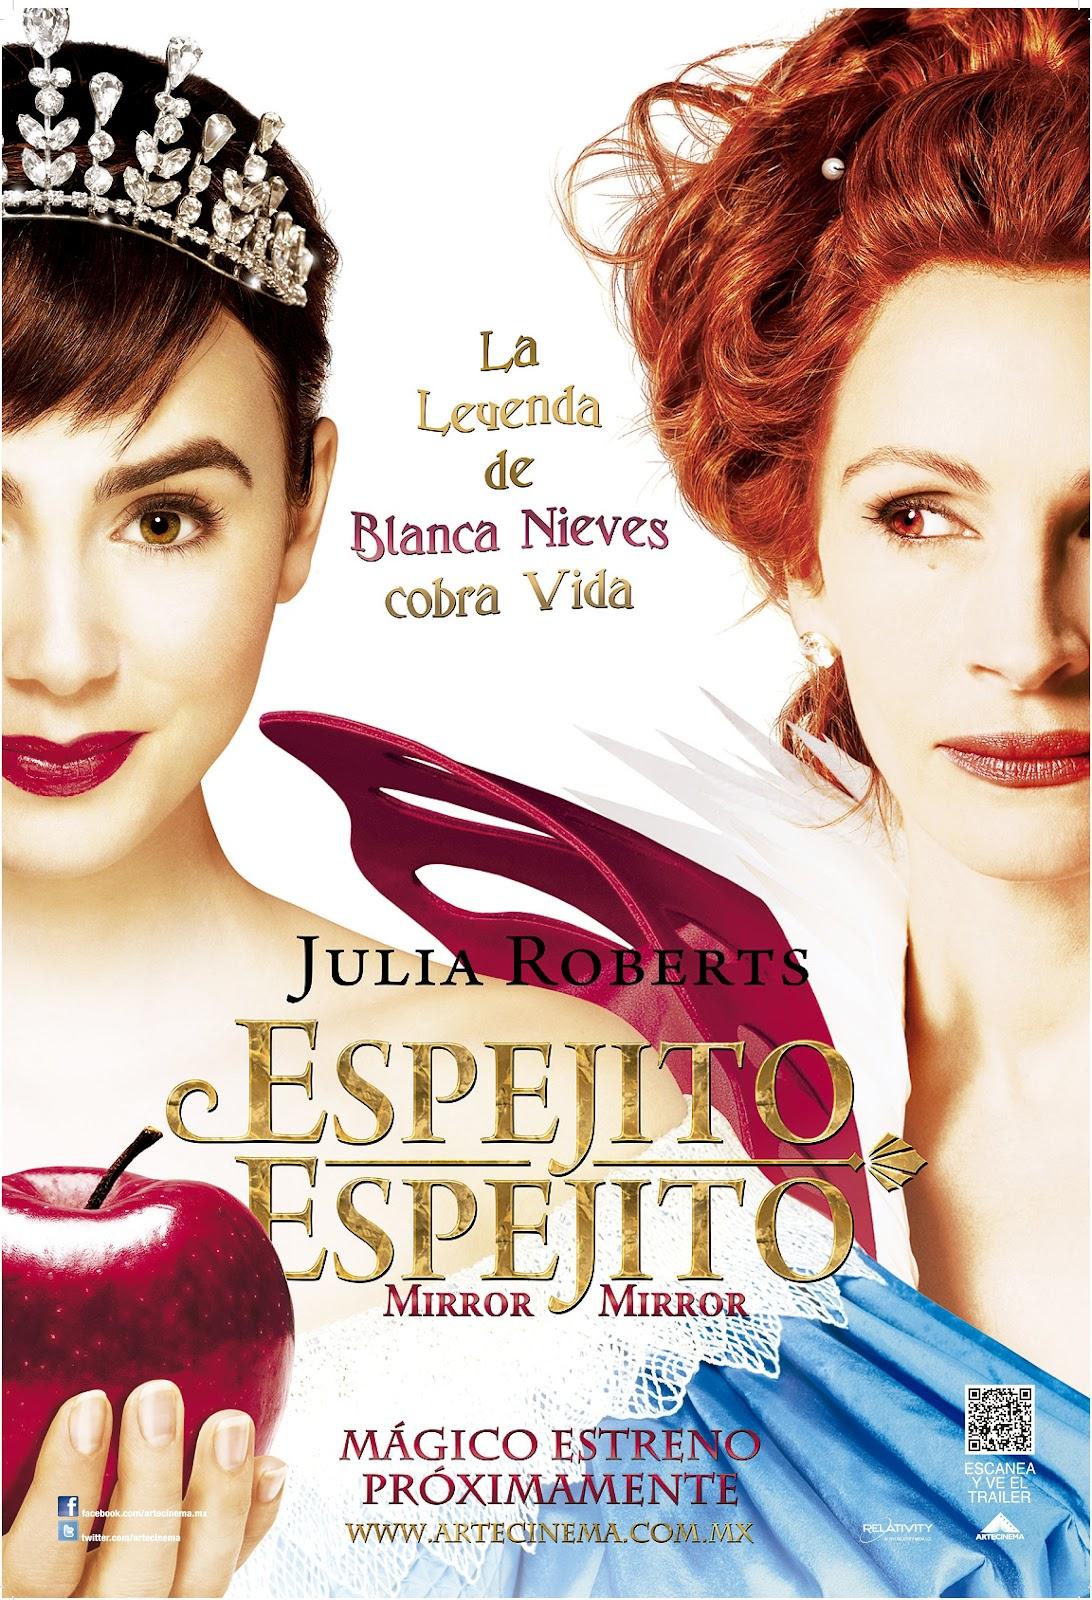 http://2.bp.blogspot.com/-8SNjFGO3vIo/UBWtgj1cR6I/AAAAAAAADoo/CcW9MwLofM8/s1600/estrenos_de_cine_05_04_2012_espejito_espejito.jpg